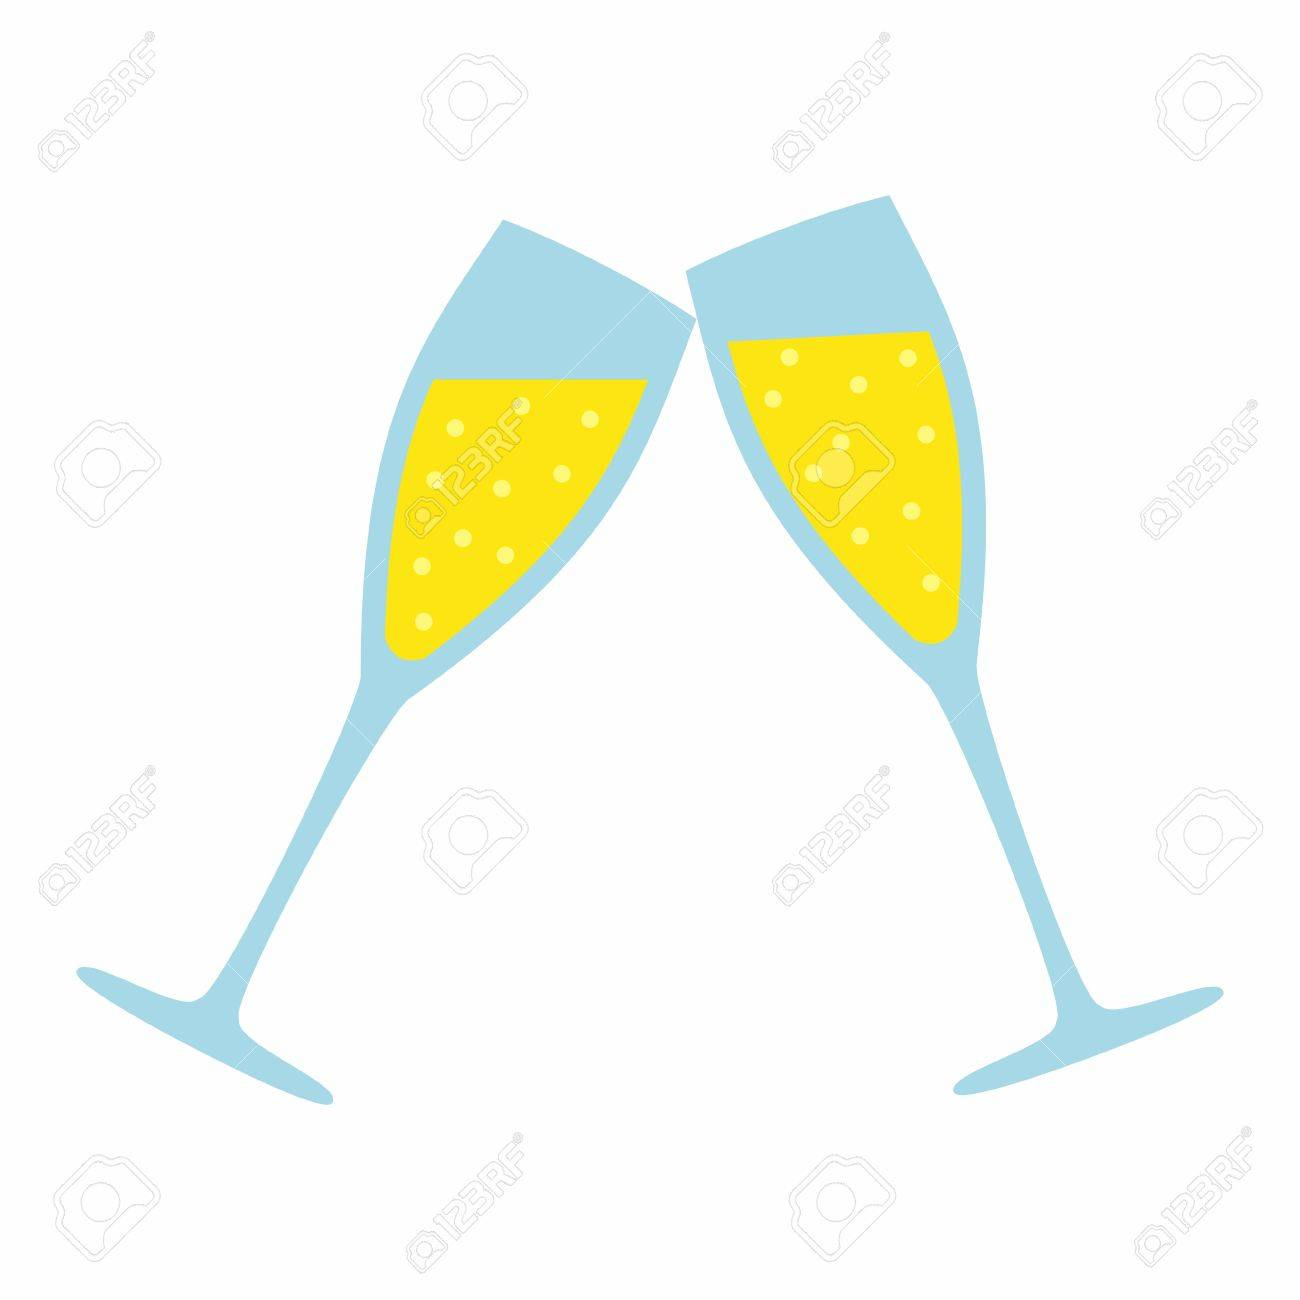 Champagne Glass isolated on white background. Wedding Illustration - 51446769